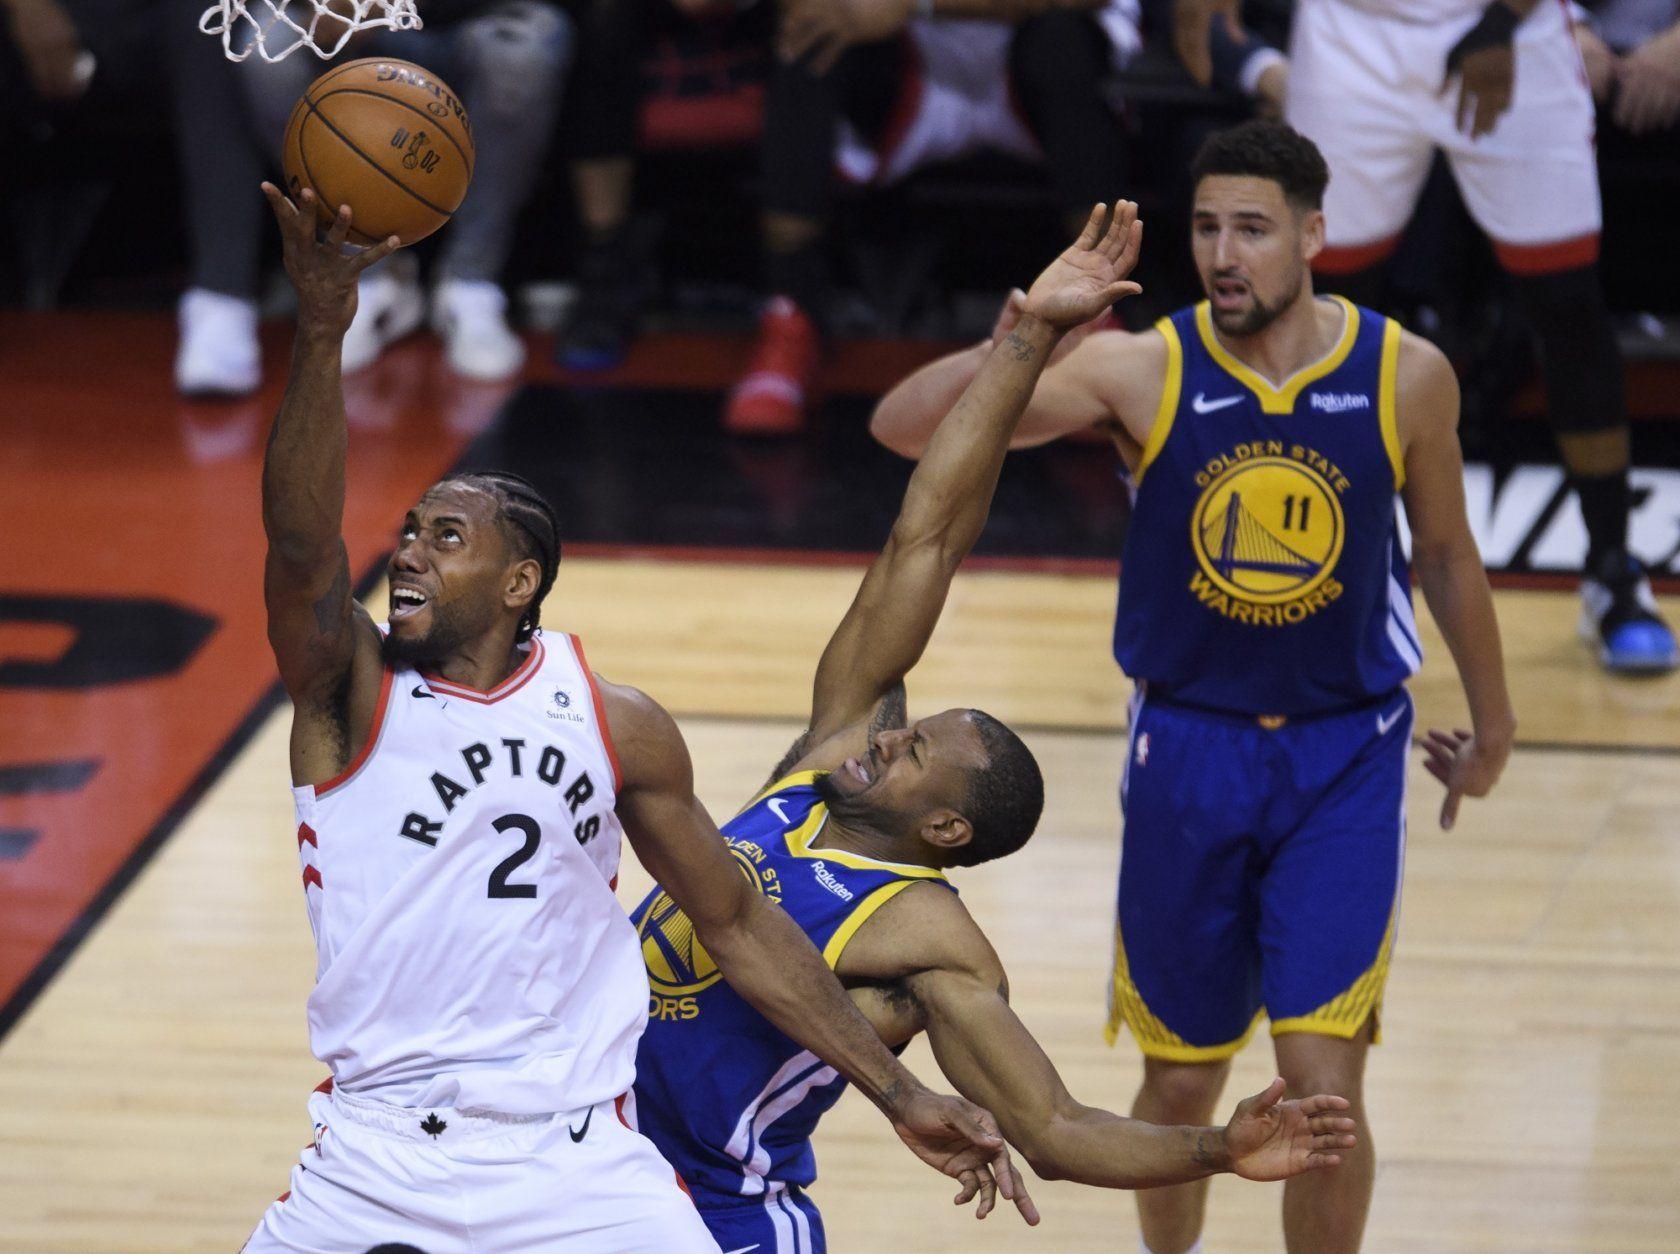 Toronto Raptors forward Kawhi Leonard (2) drives past Golden State Warriors forward Andre Iguodala during first-half basketball action in Game 5 of the NBA Finals in Toronto, Monday, June 10, 2019. (Nathan Denette/The Canadian Press via AP)